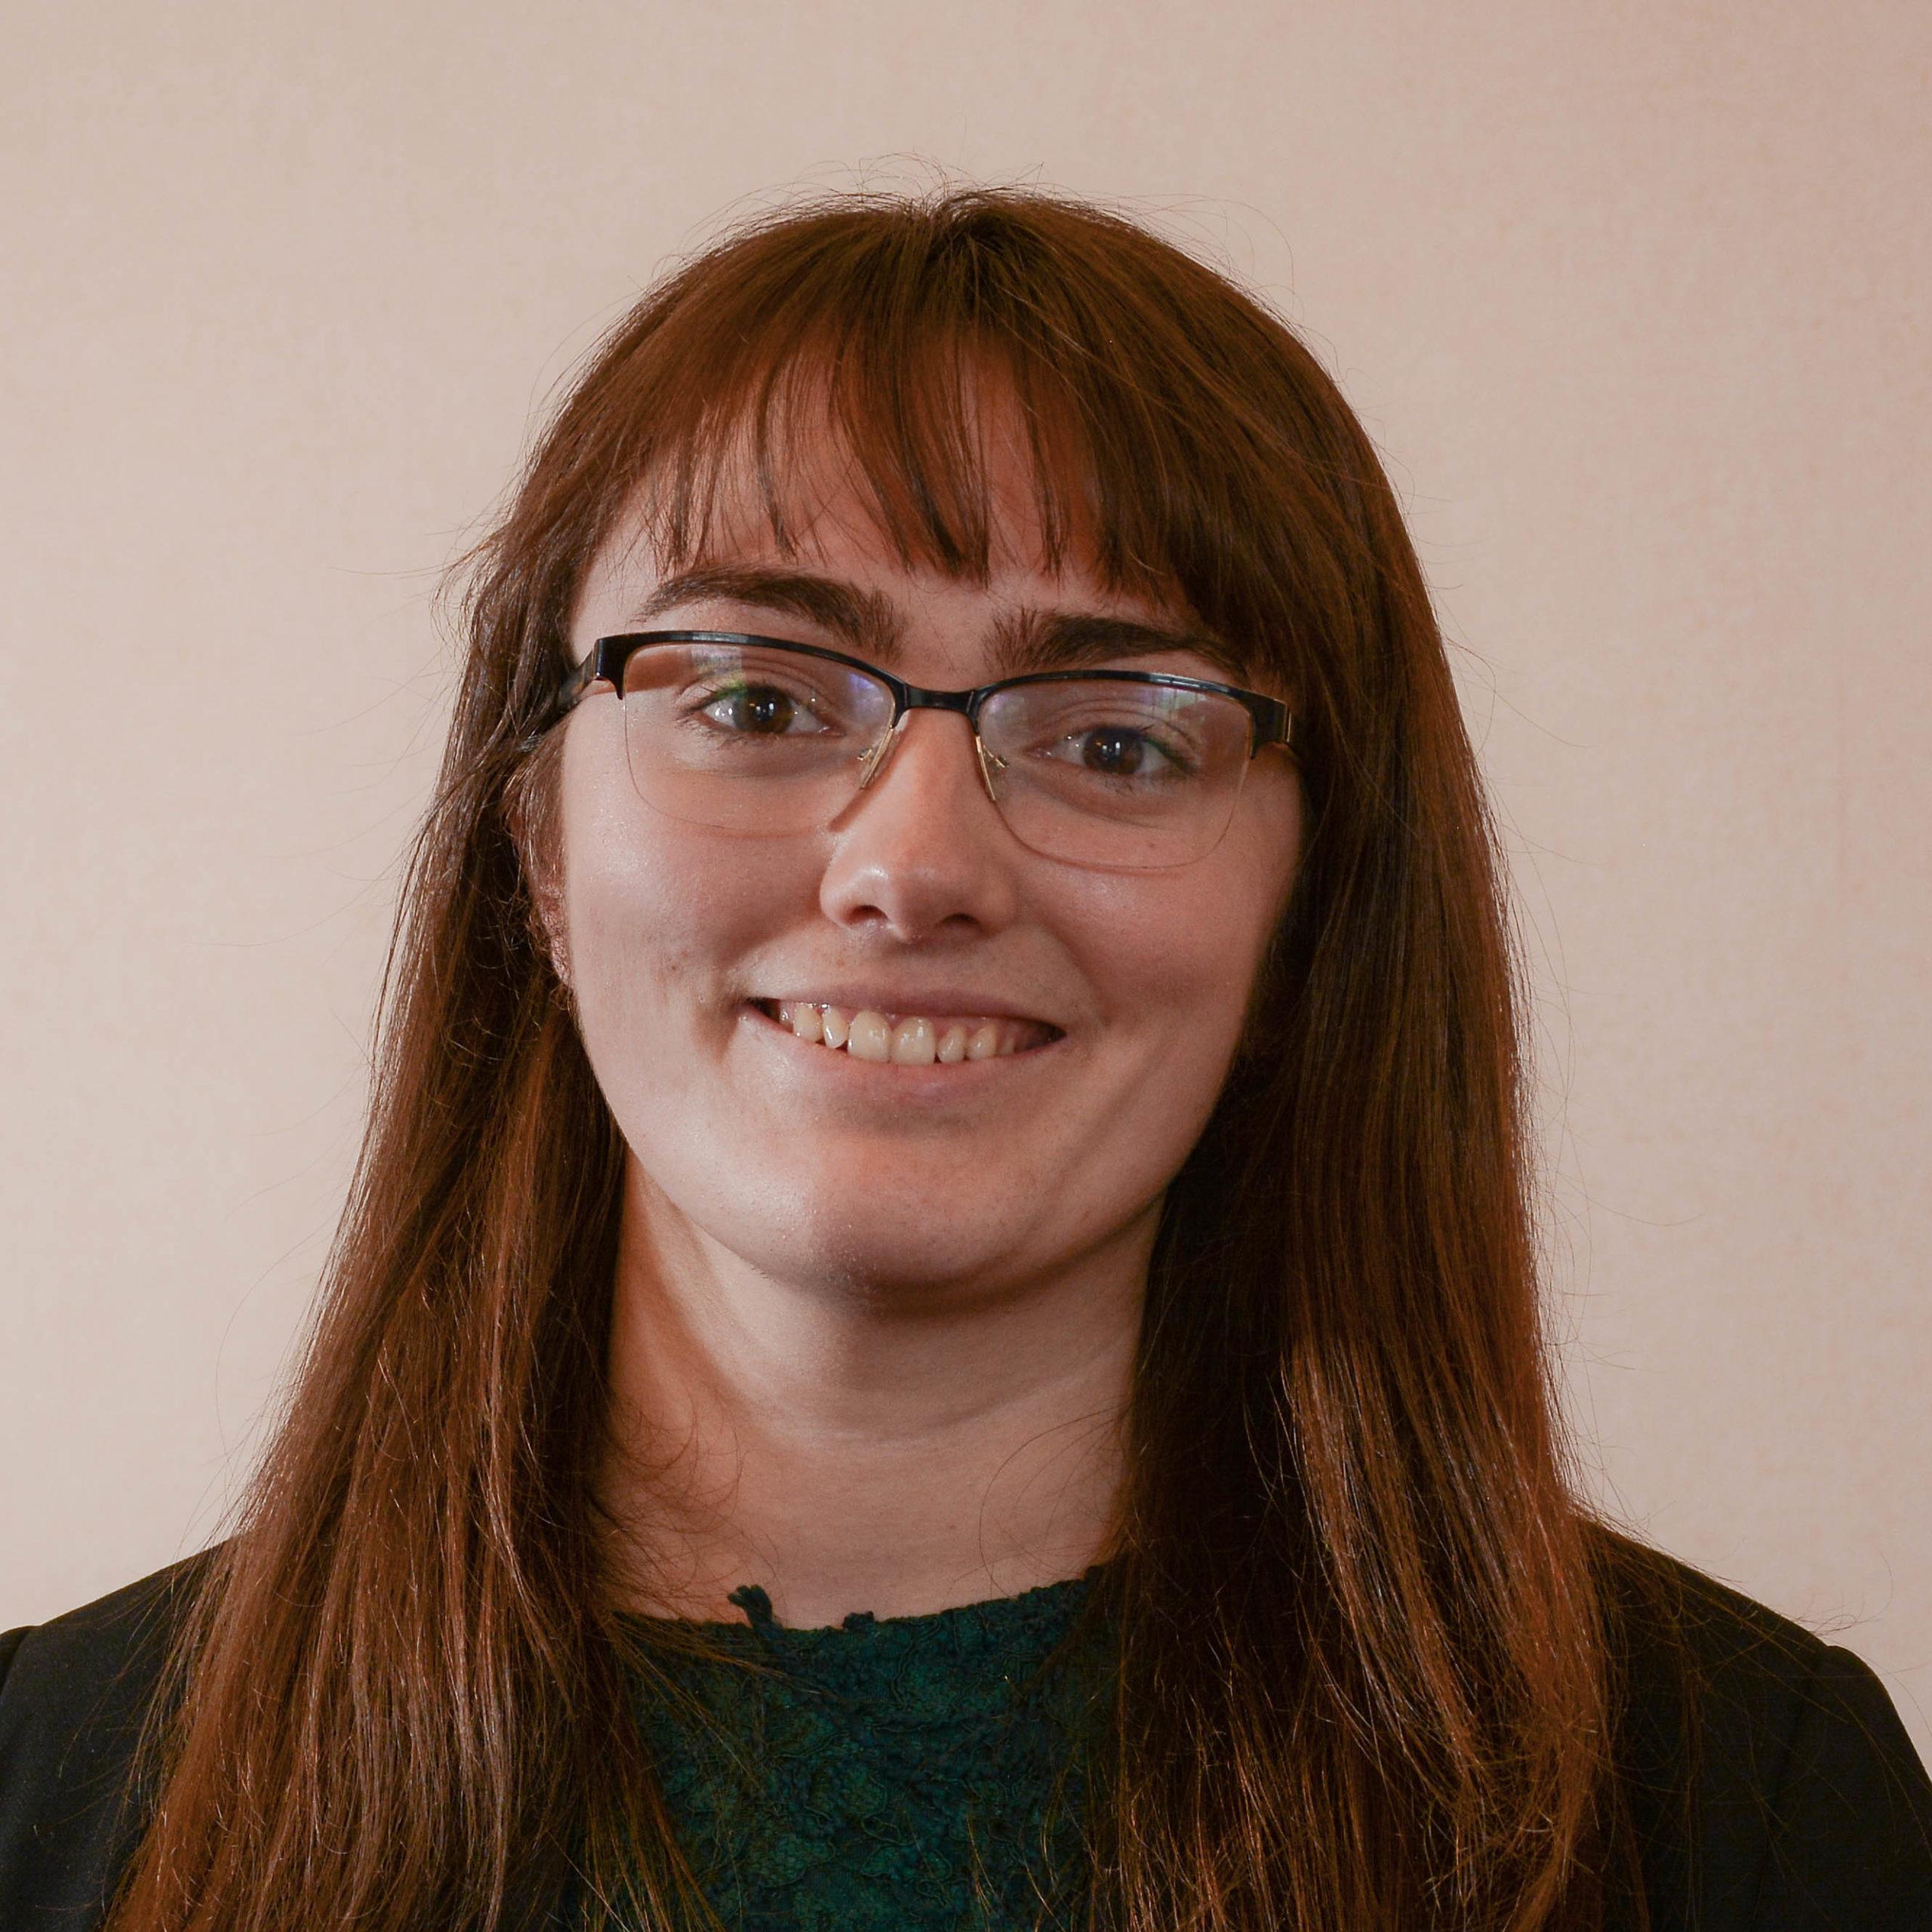 An image ofRona Burns